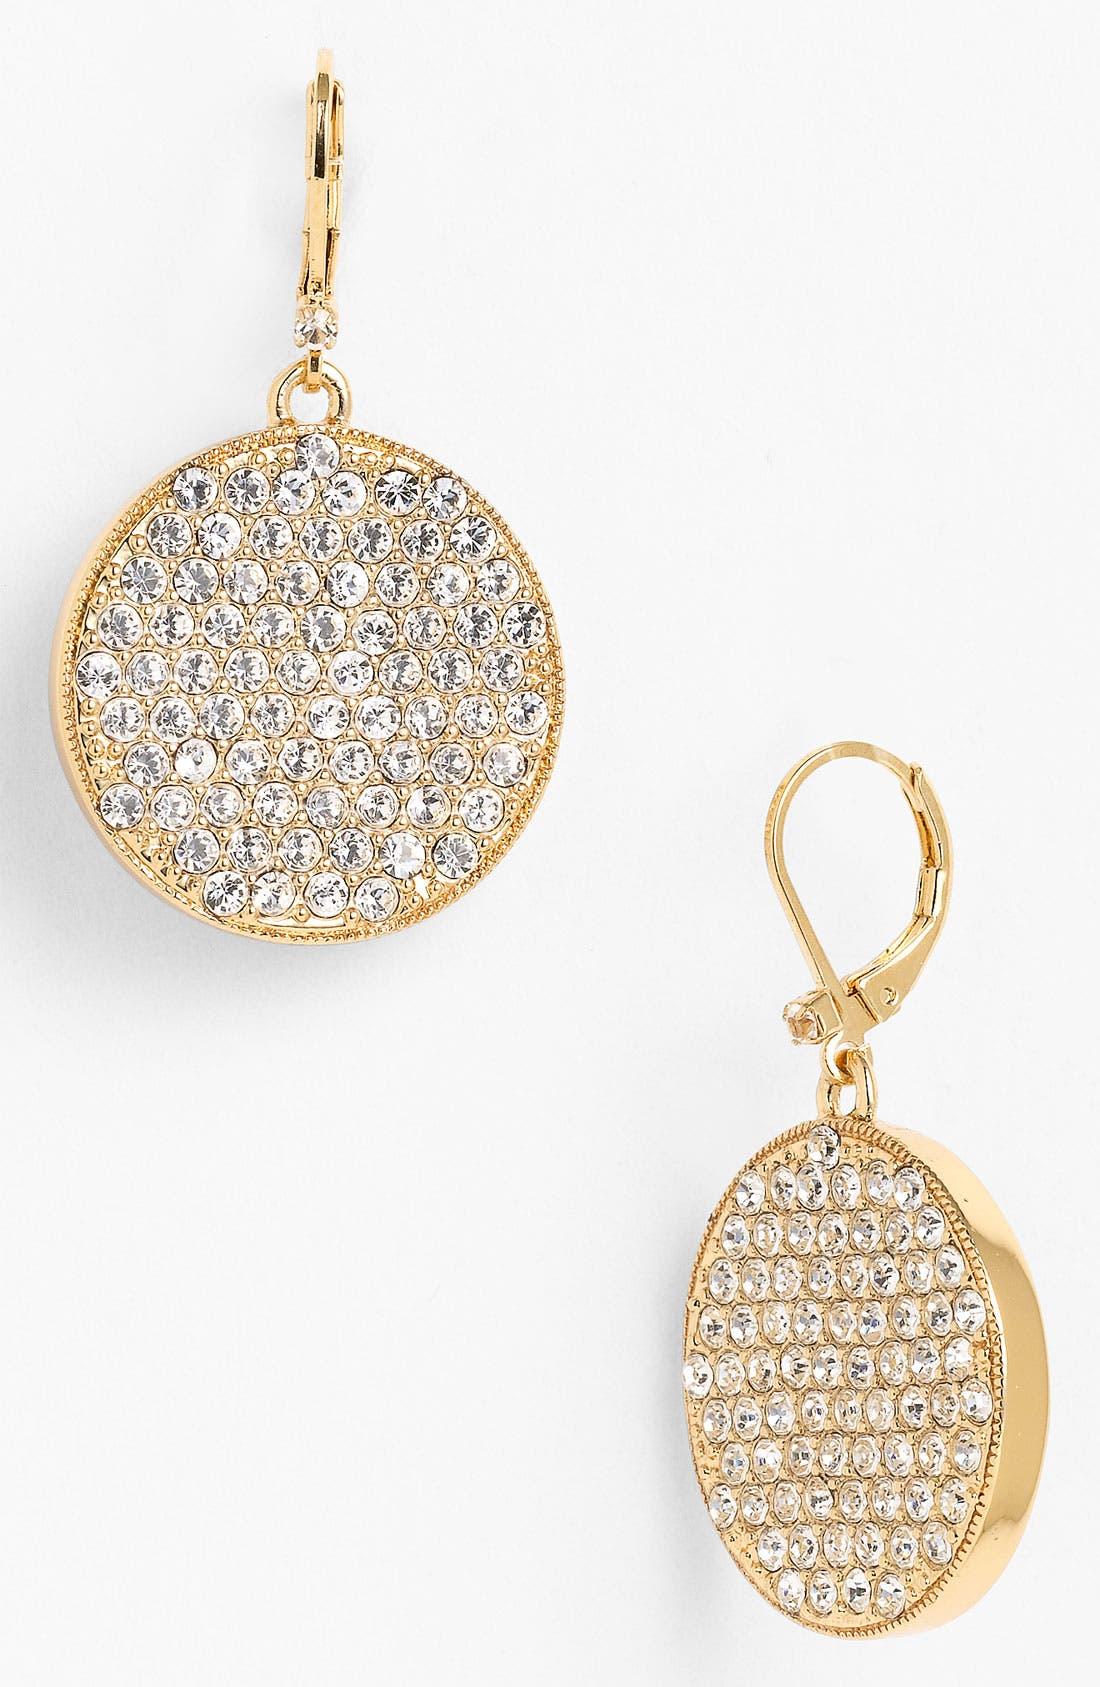 Alternate Image 1 Selected - kate spade new york 'bright spot' drop earrings